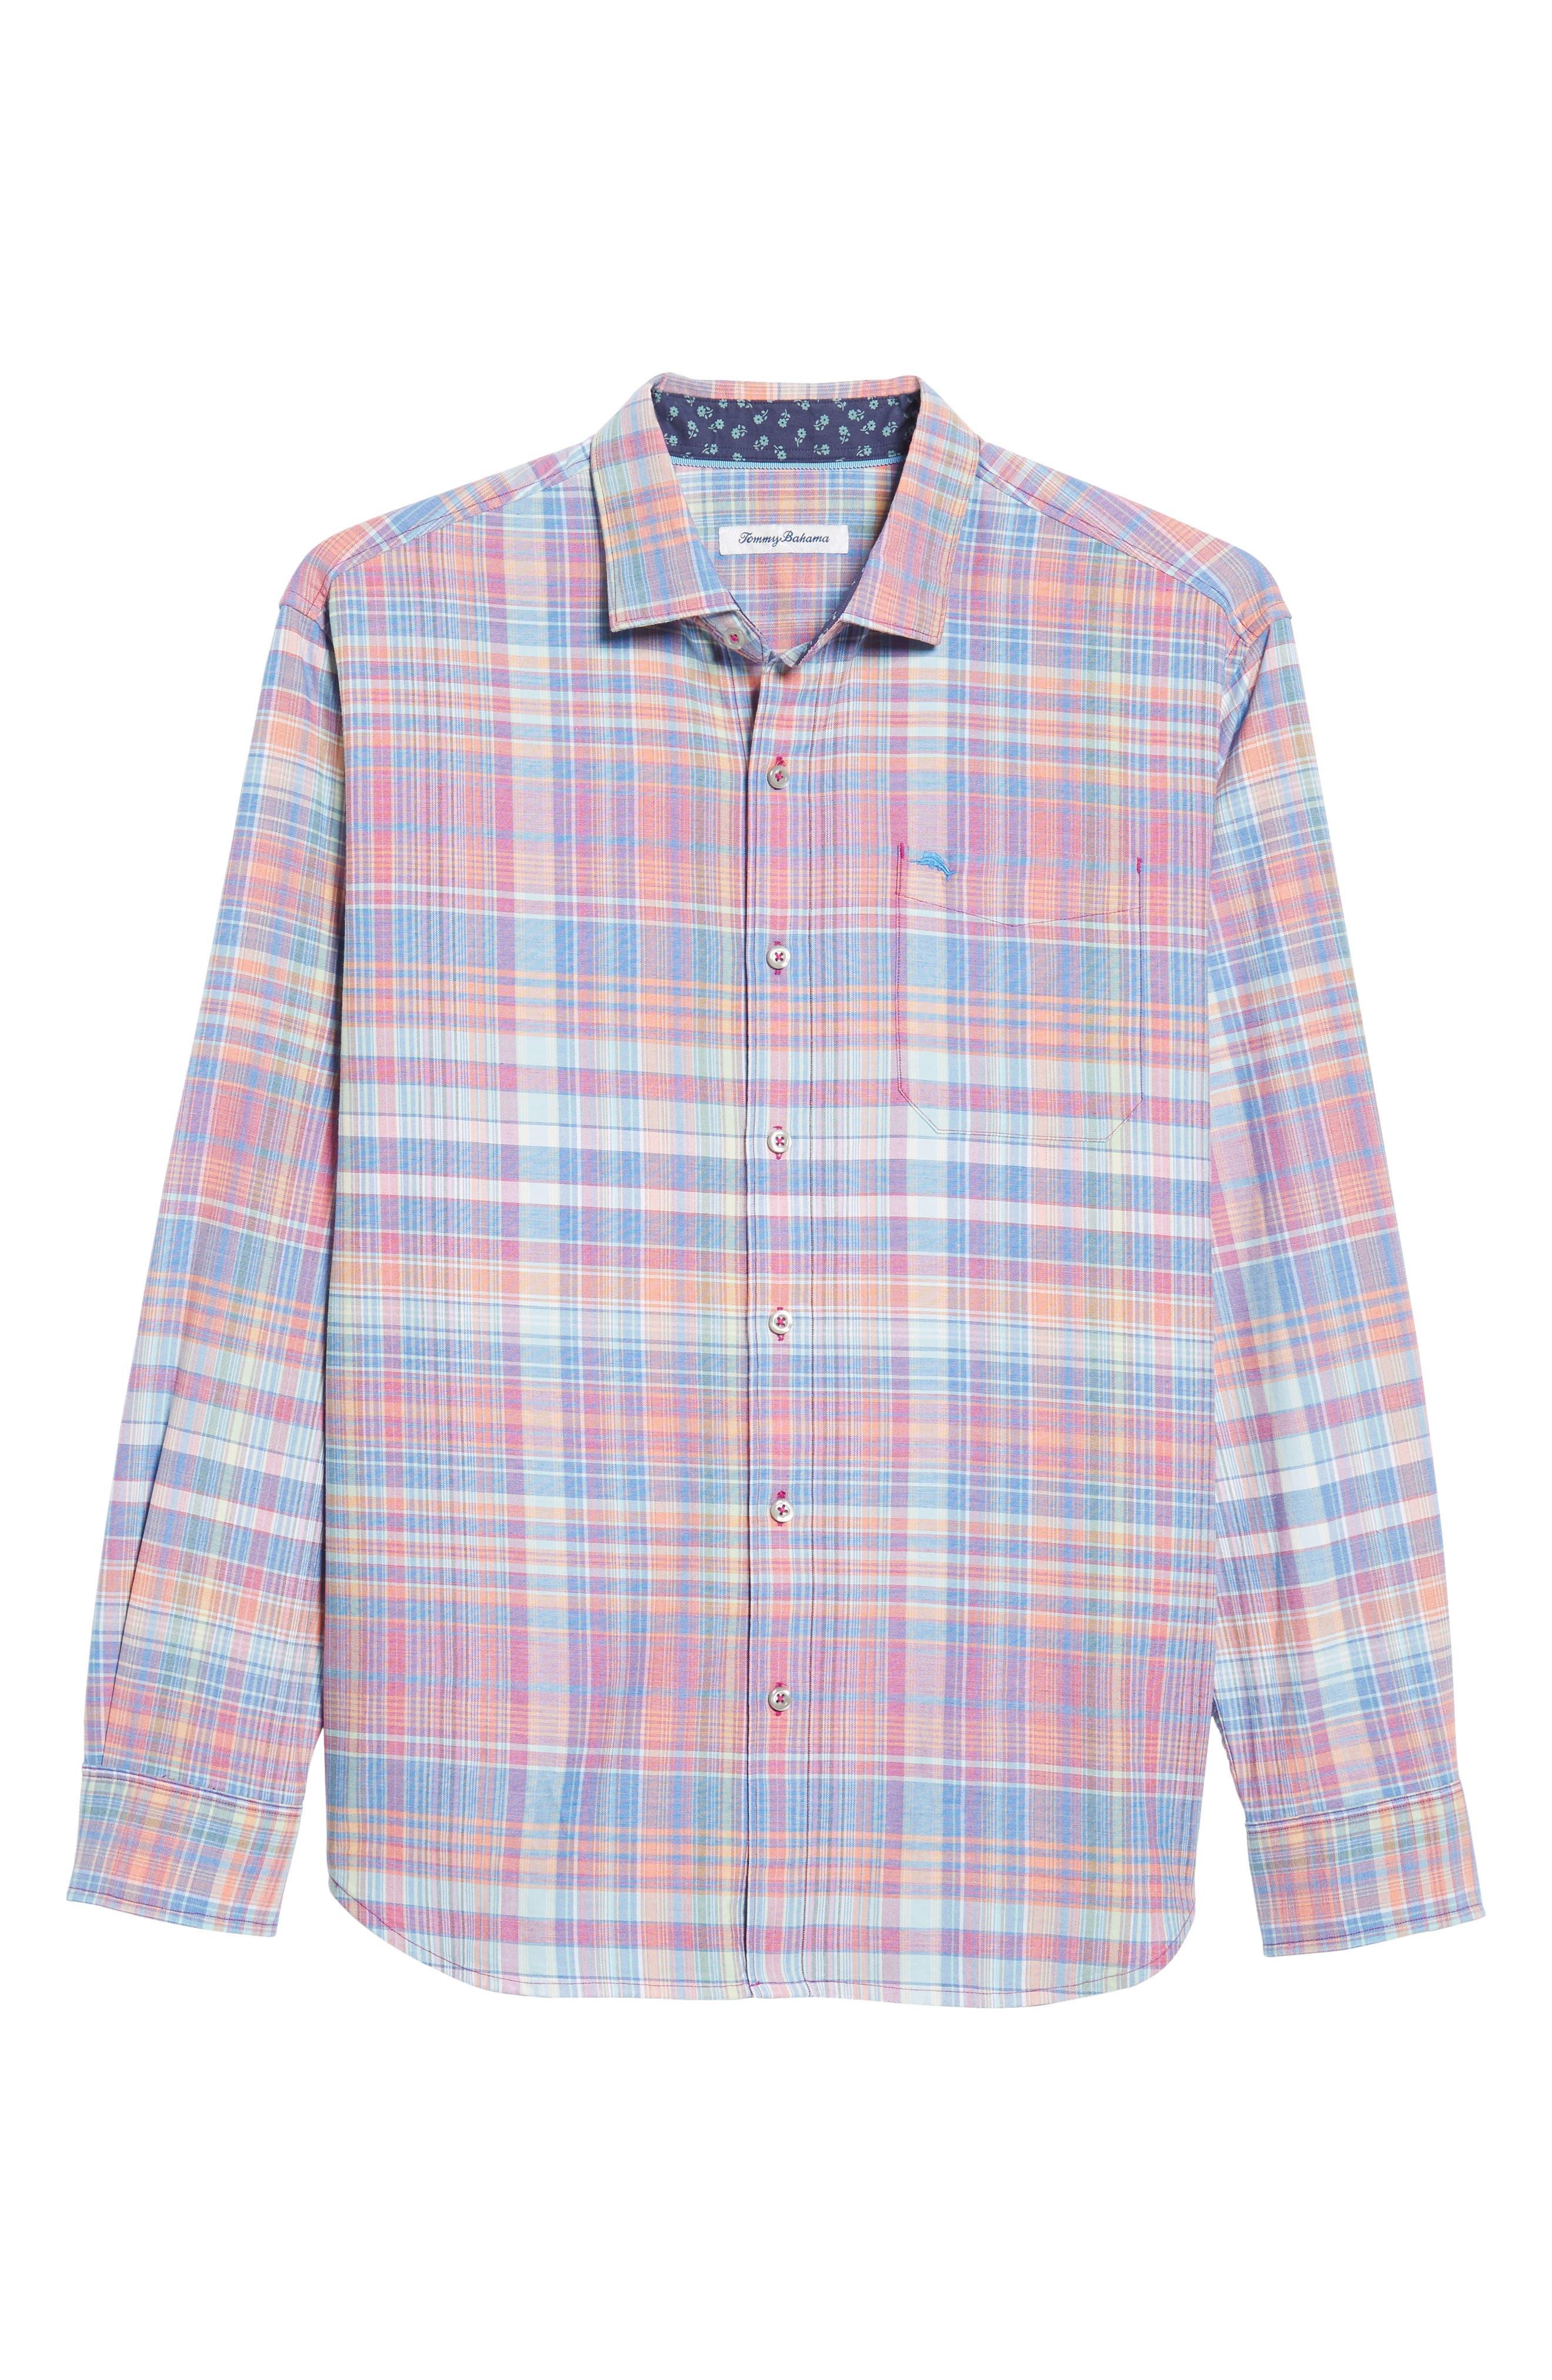 Mangrove Madras Regular Fit Sport Shirt,                             Alternate thumbnail 6, color,                             Virtual Pink